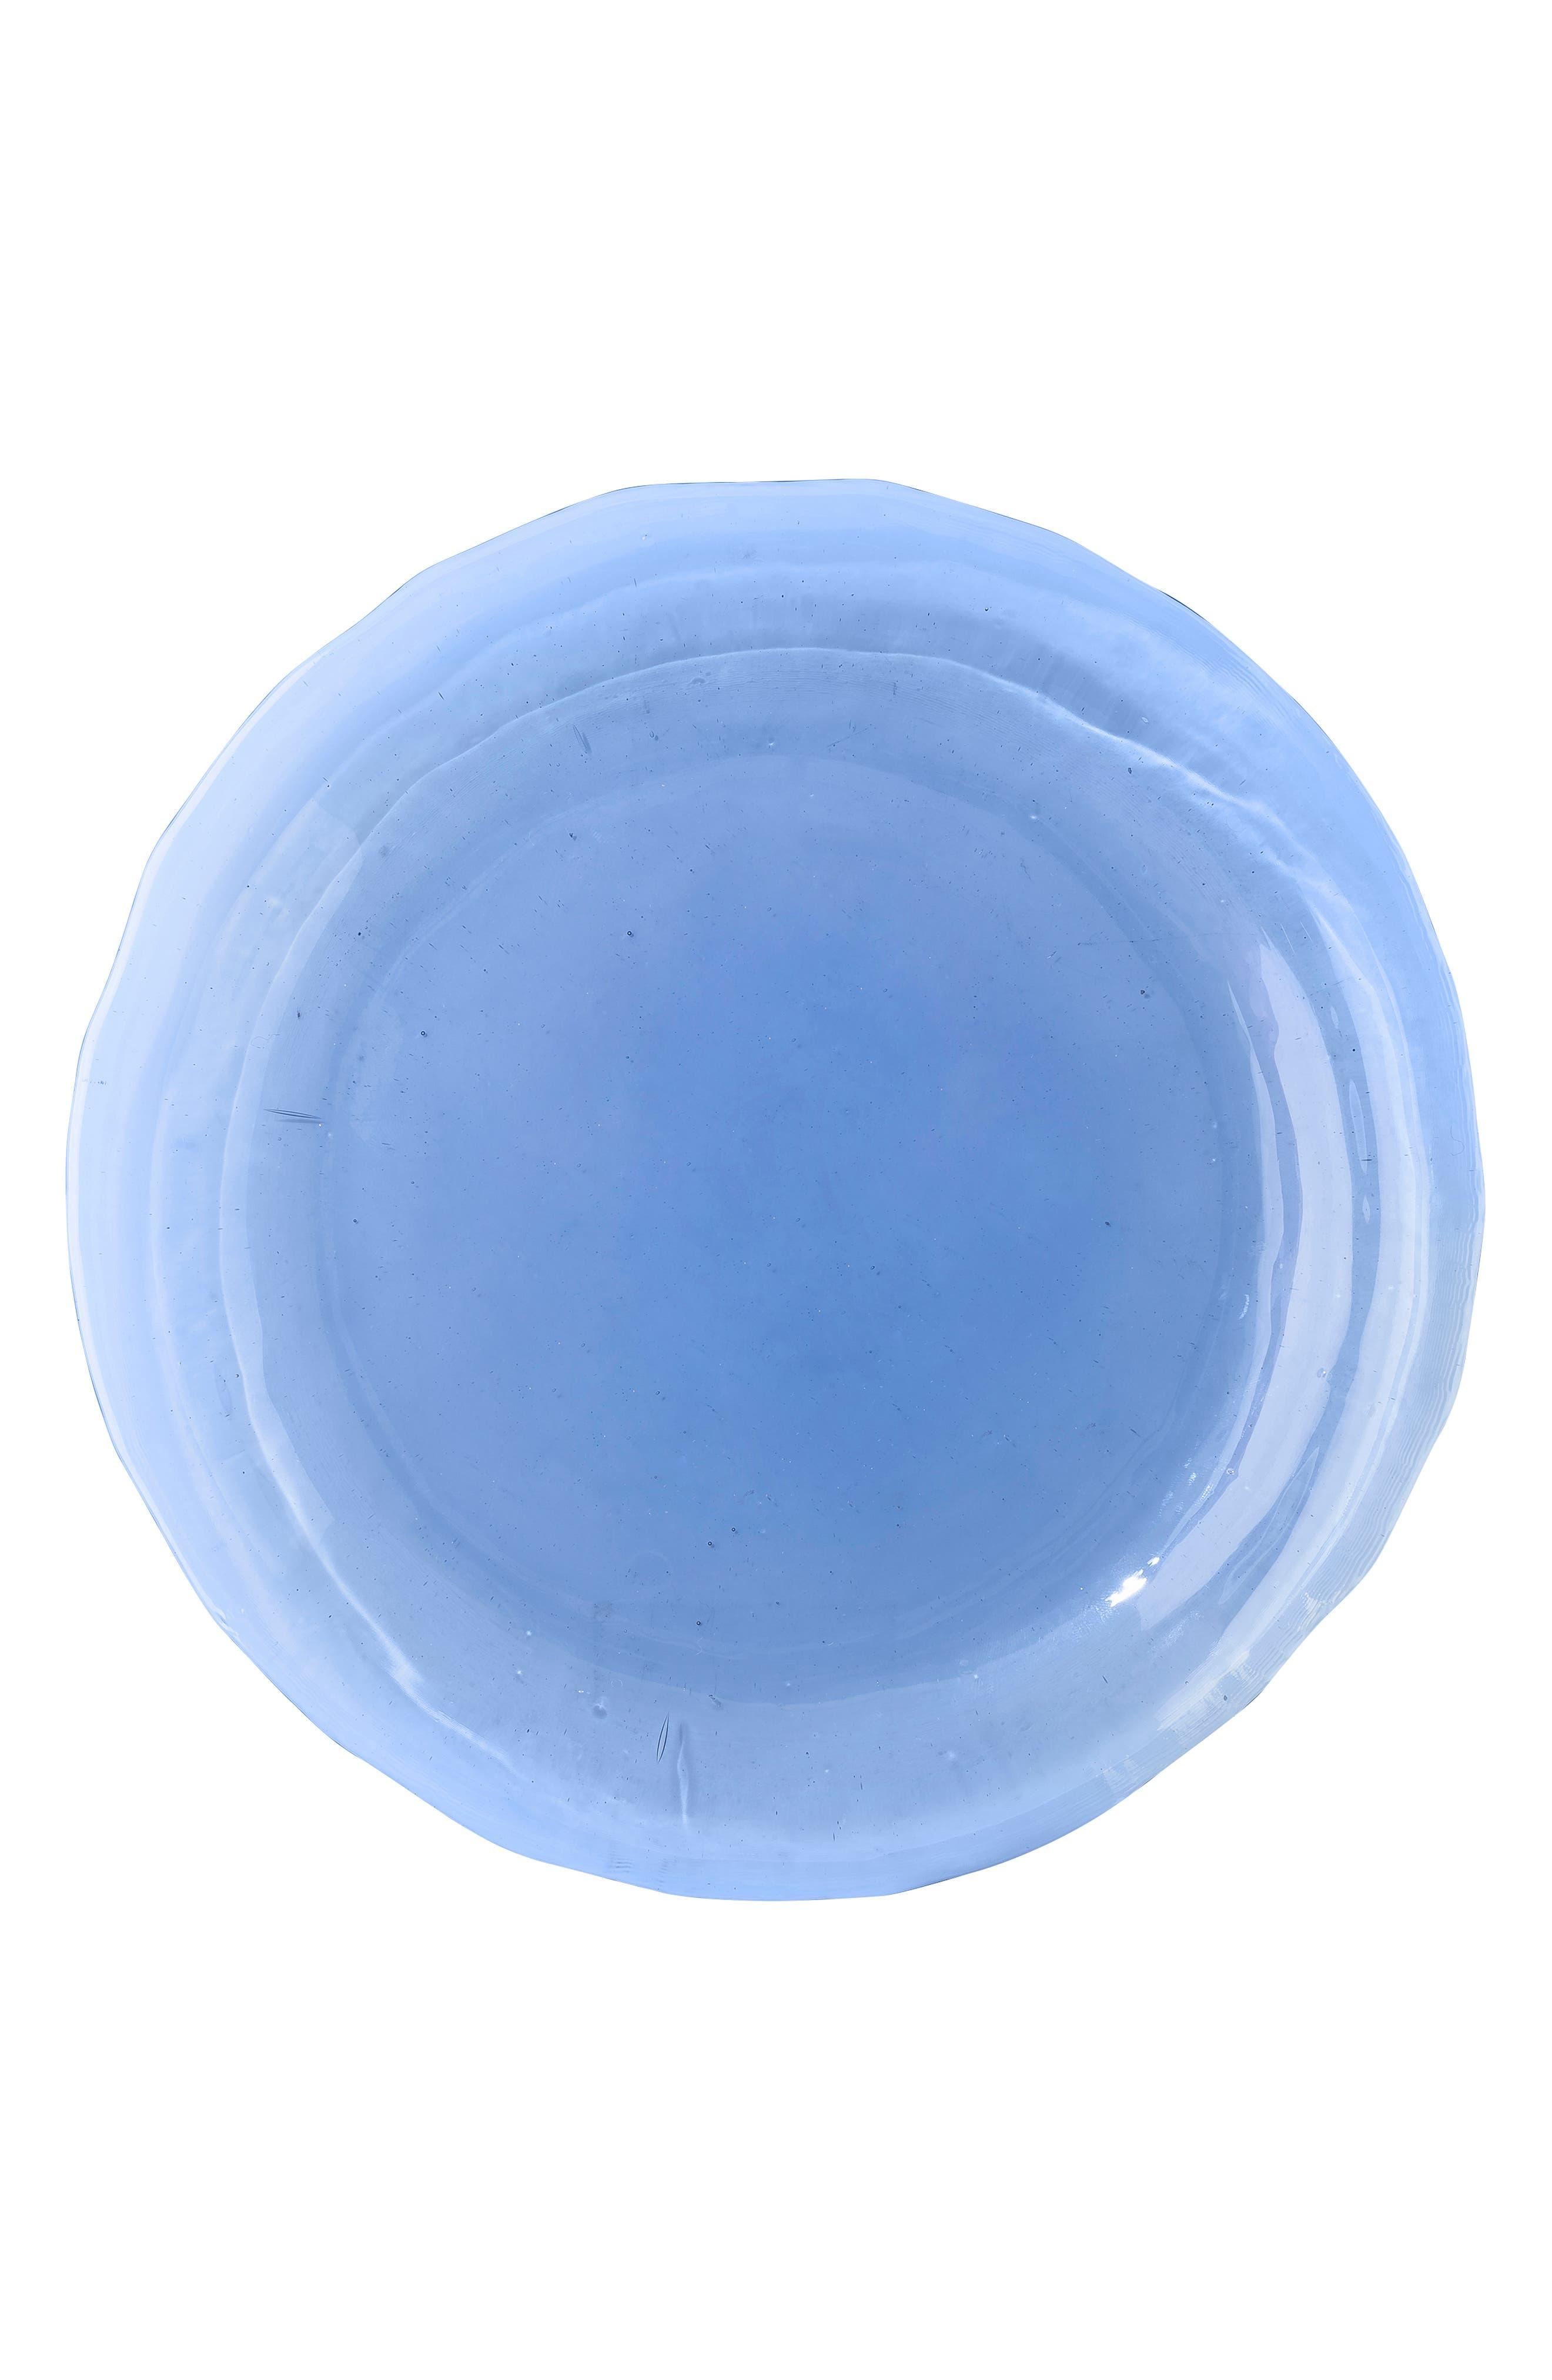 JULISKA,                             Carine Salad Plate,                             Main thumbnail 1, color,                             BLUE